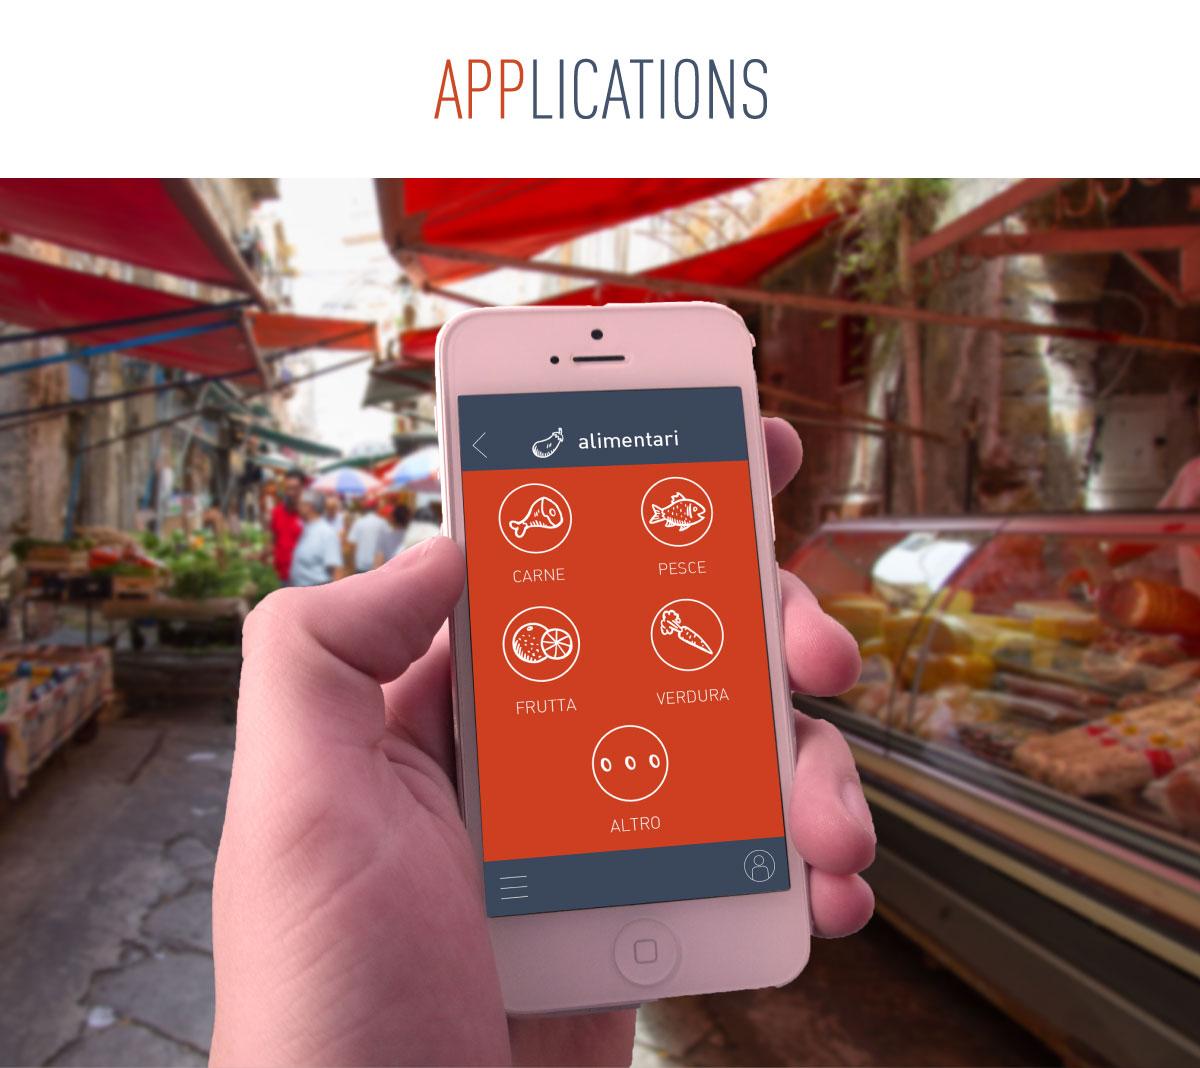 app_food_markets_palermo5